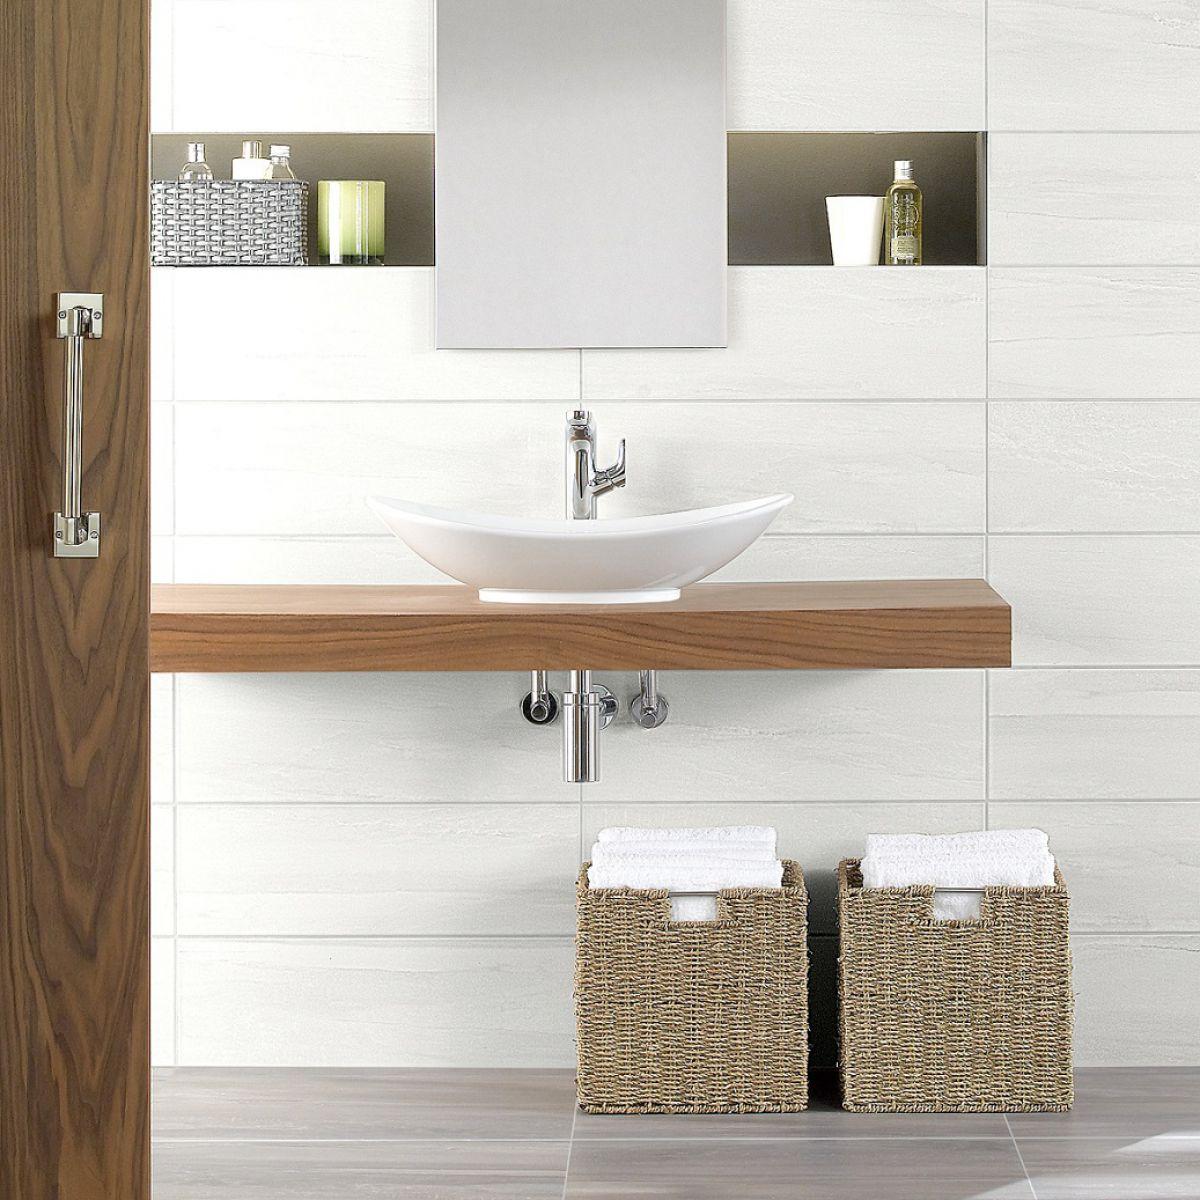 villeroy boch my nature stadium countertop basin uk bathrooms. Black Bedroom Furniture Sets. Home Design Ideas